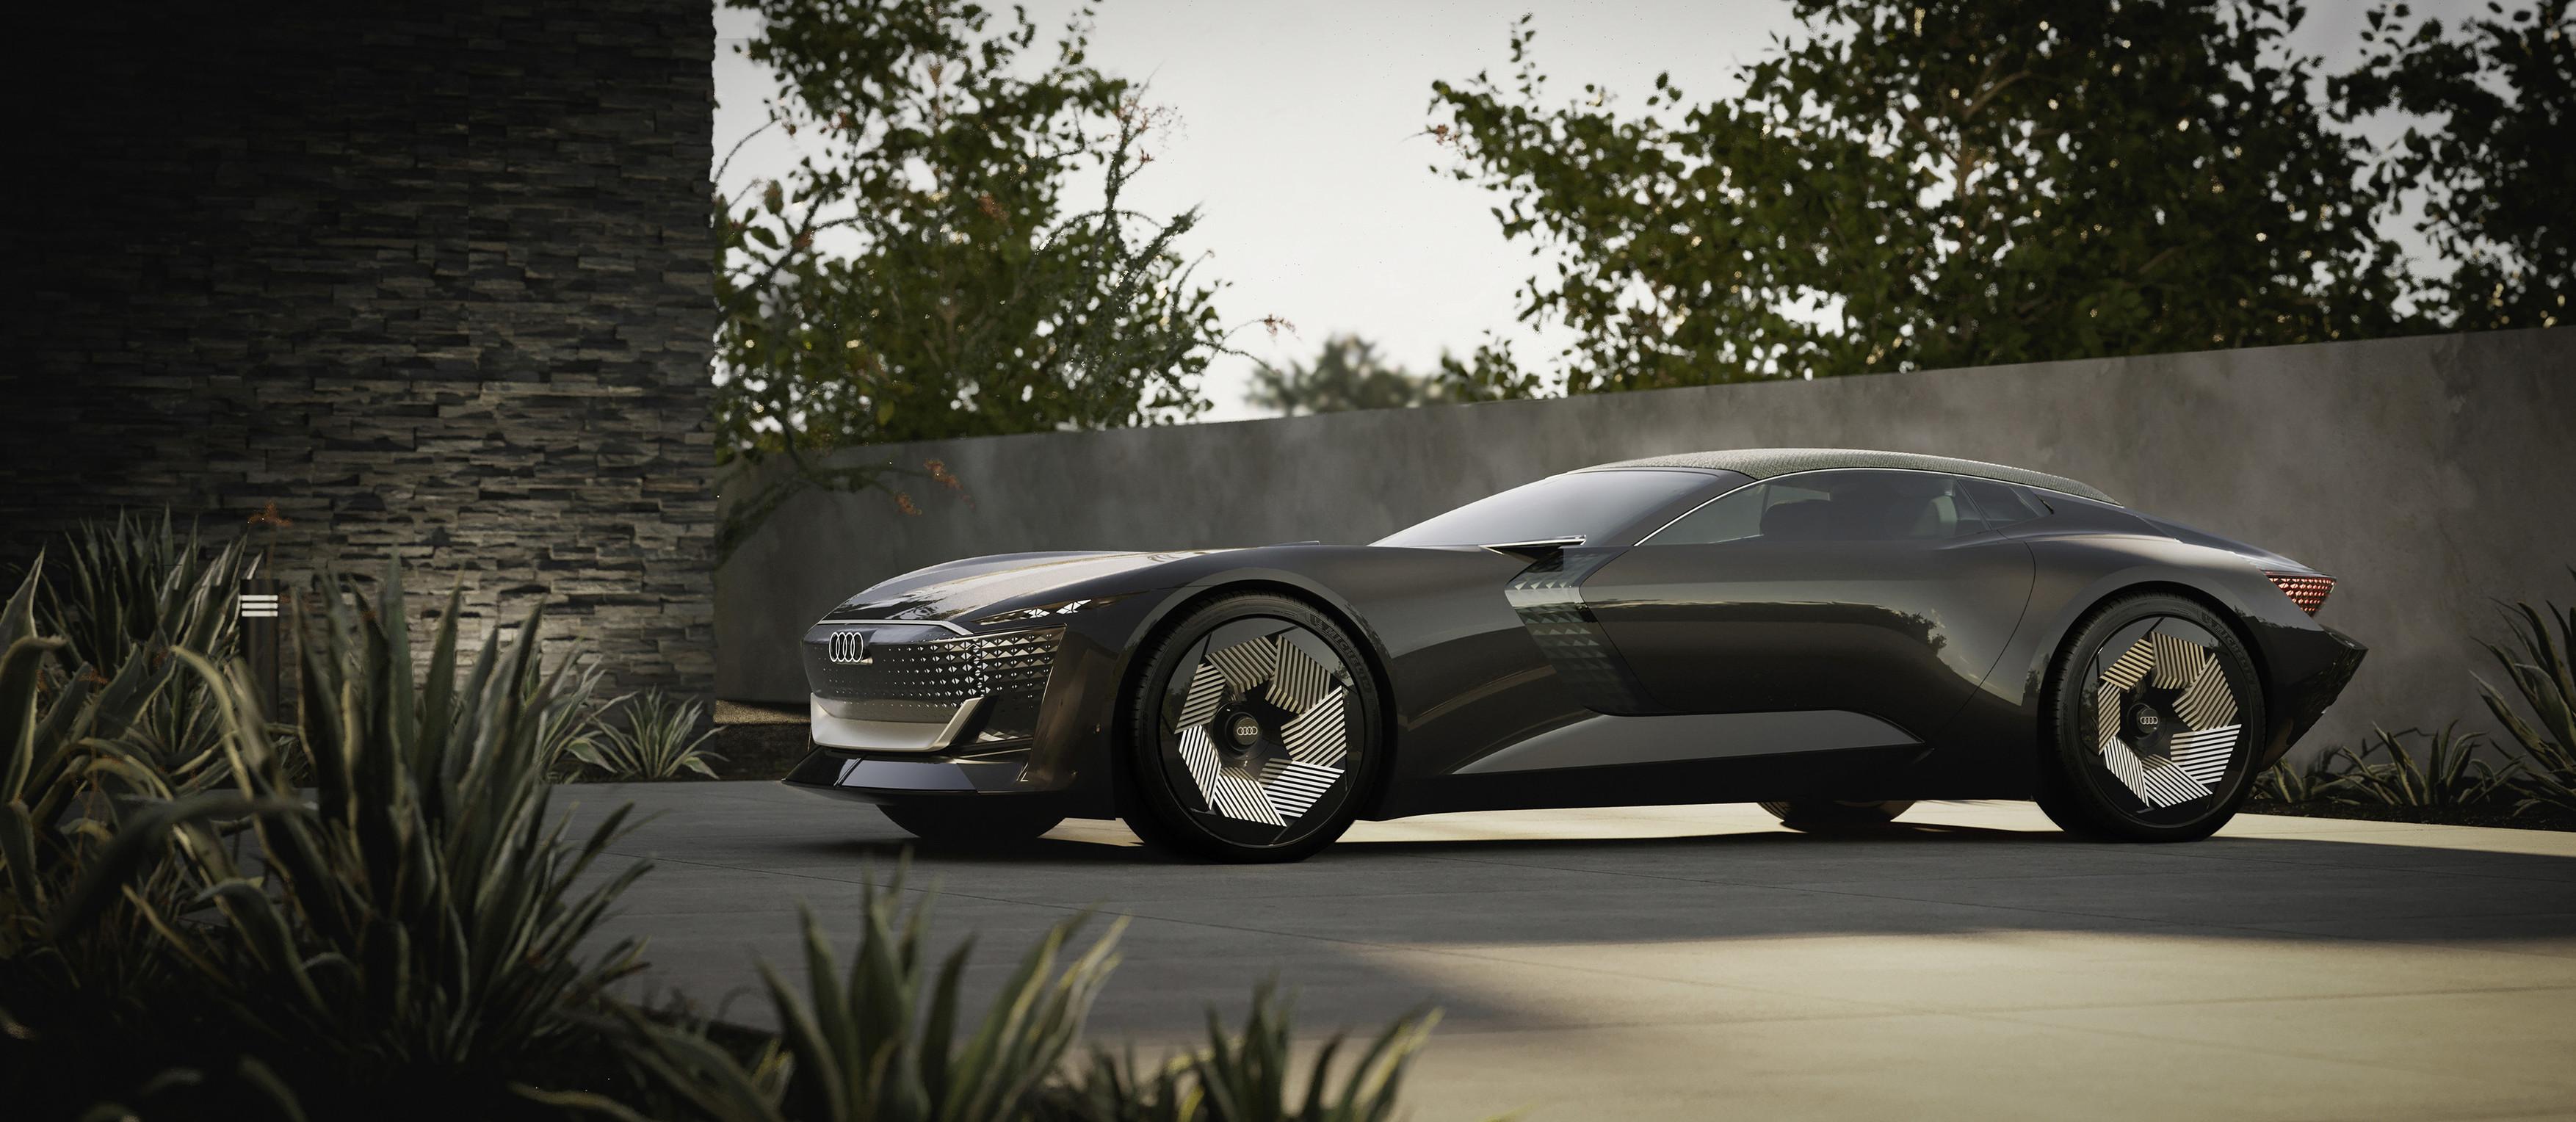 Audi koncept skysphere